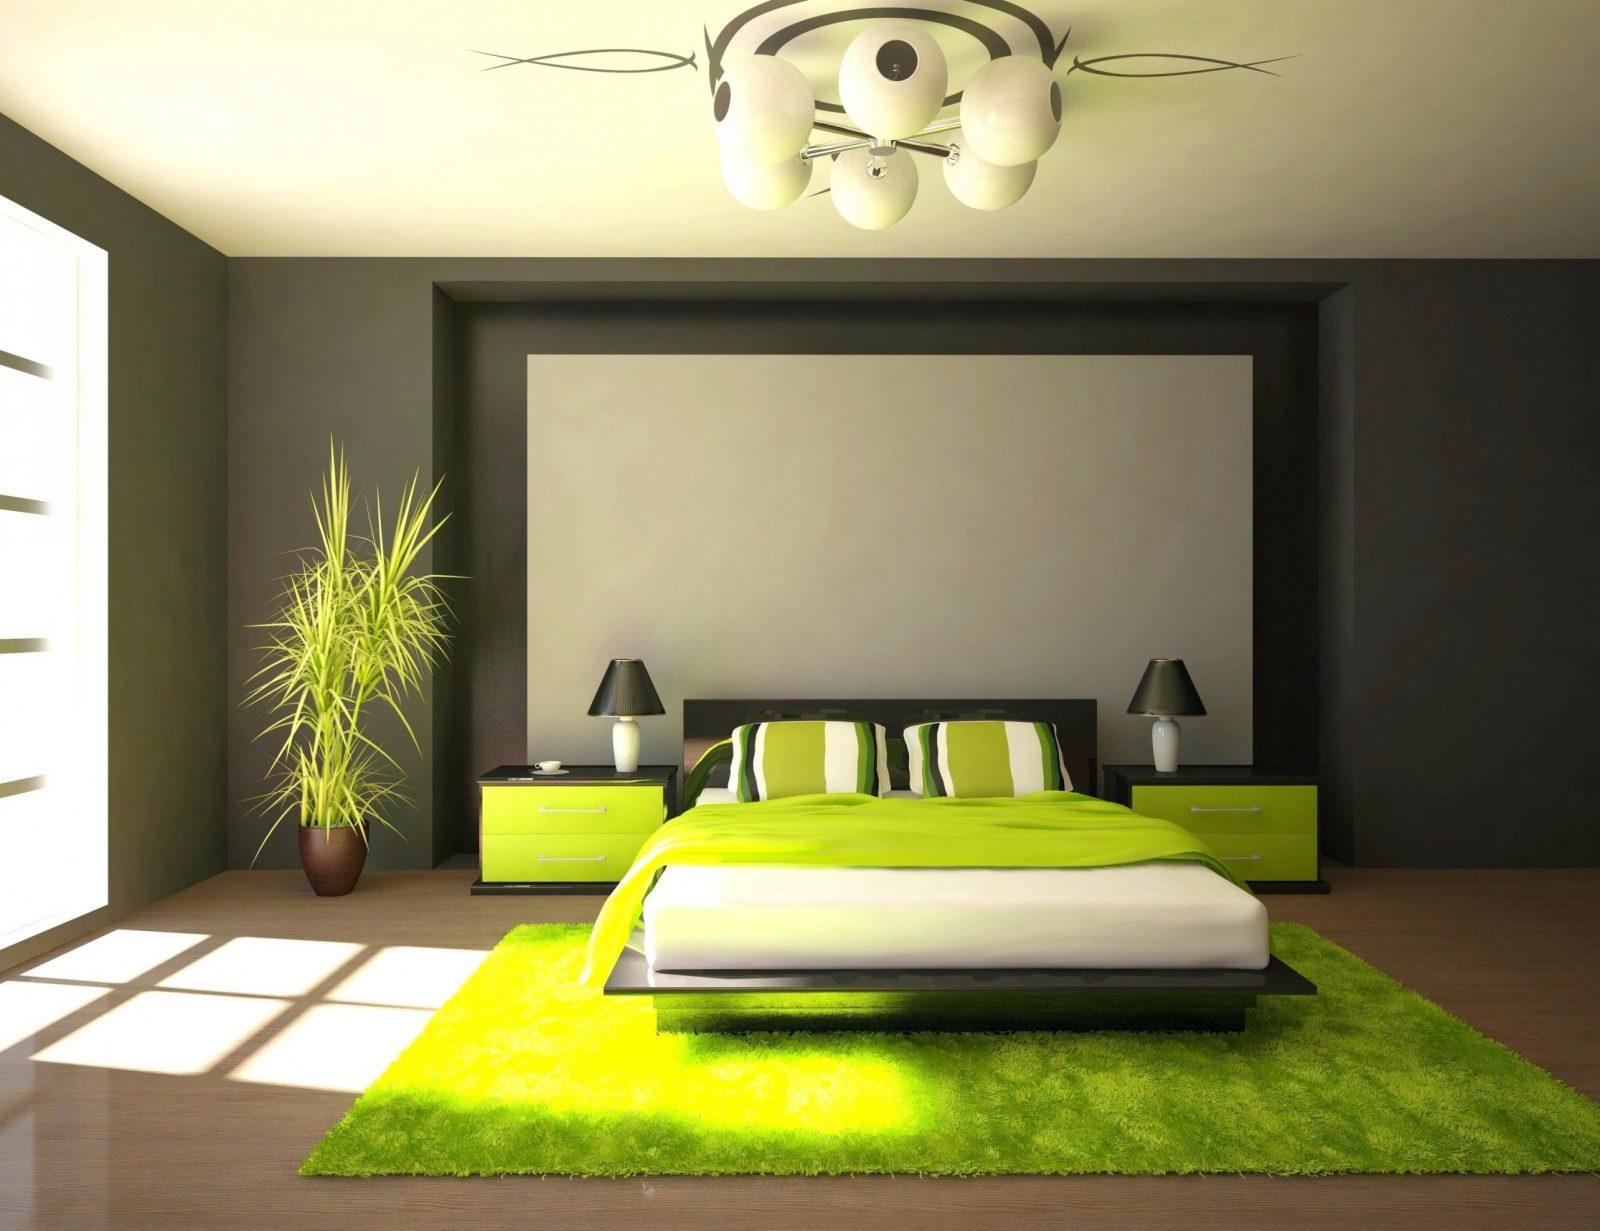 Feng Shui Farben Schlafzimmer Inspirierend Schön Schlafzimmer von Bilder Schlafzimmer Feng Shui Bild